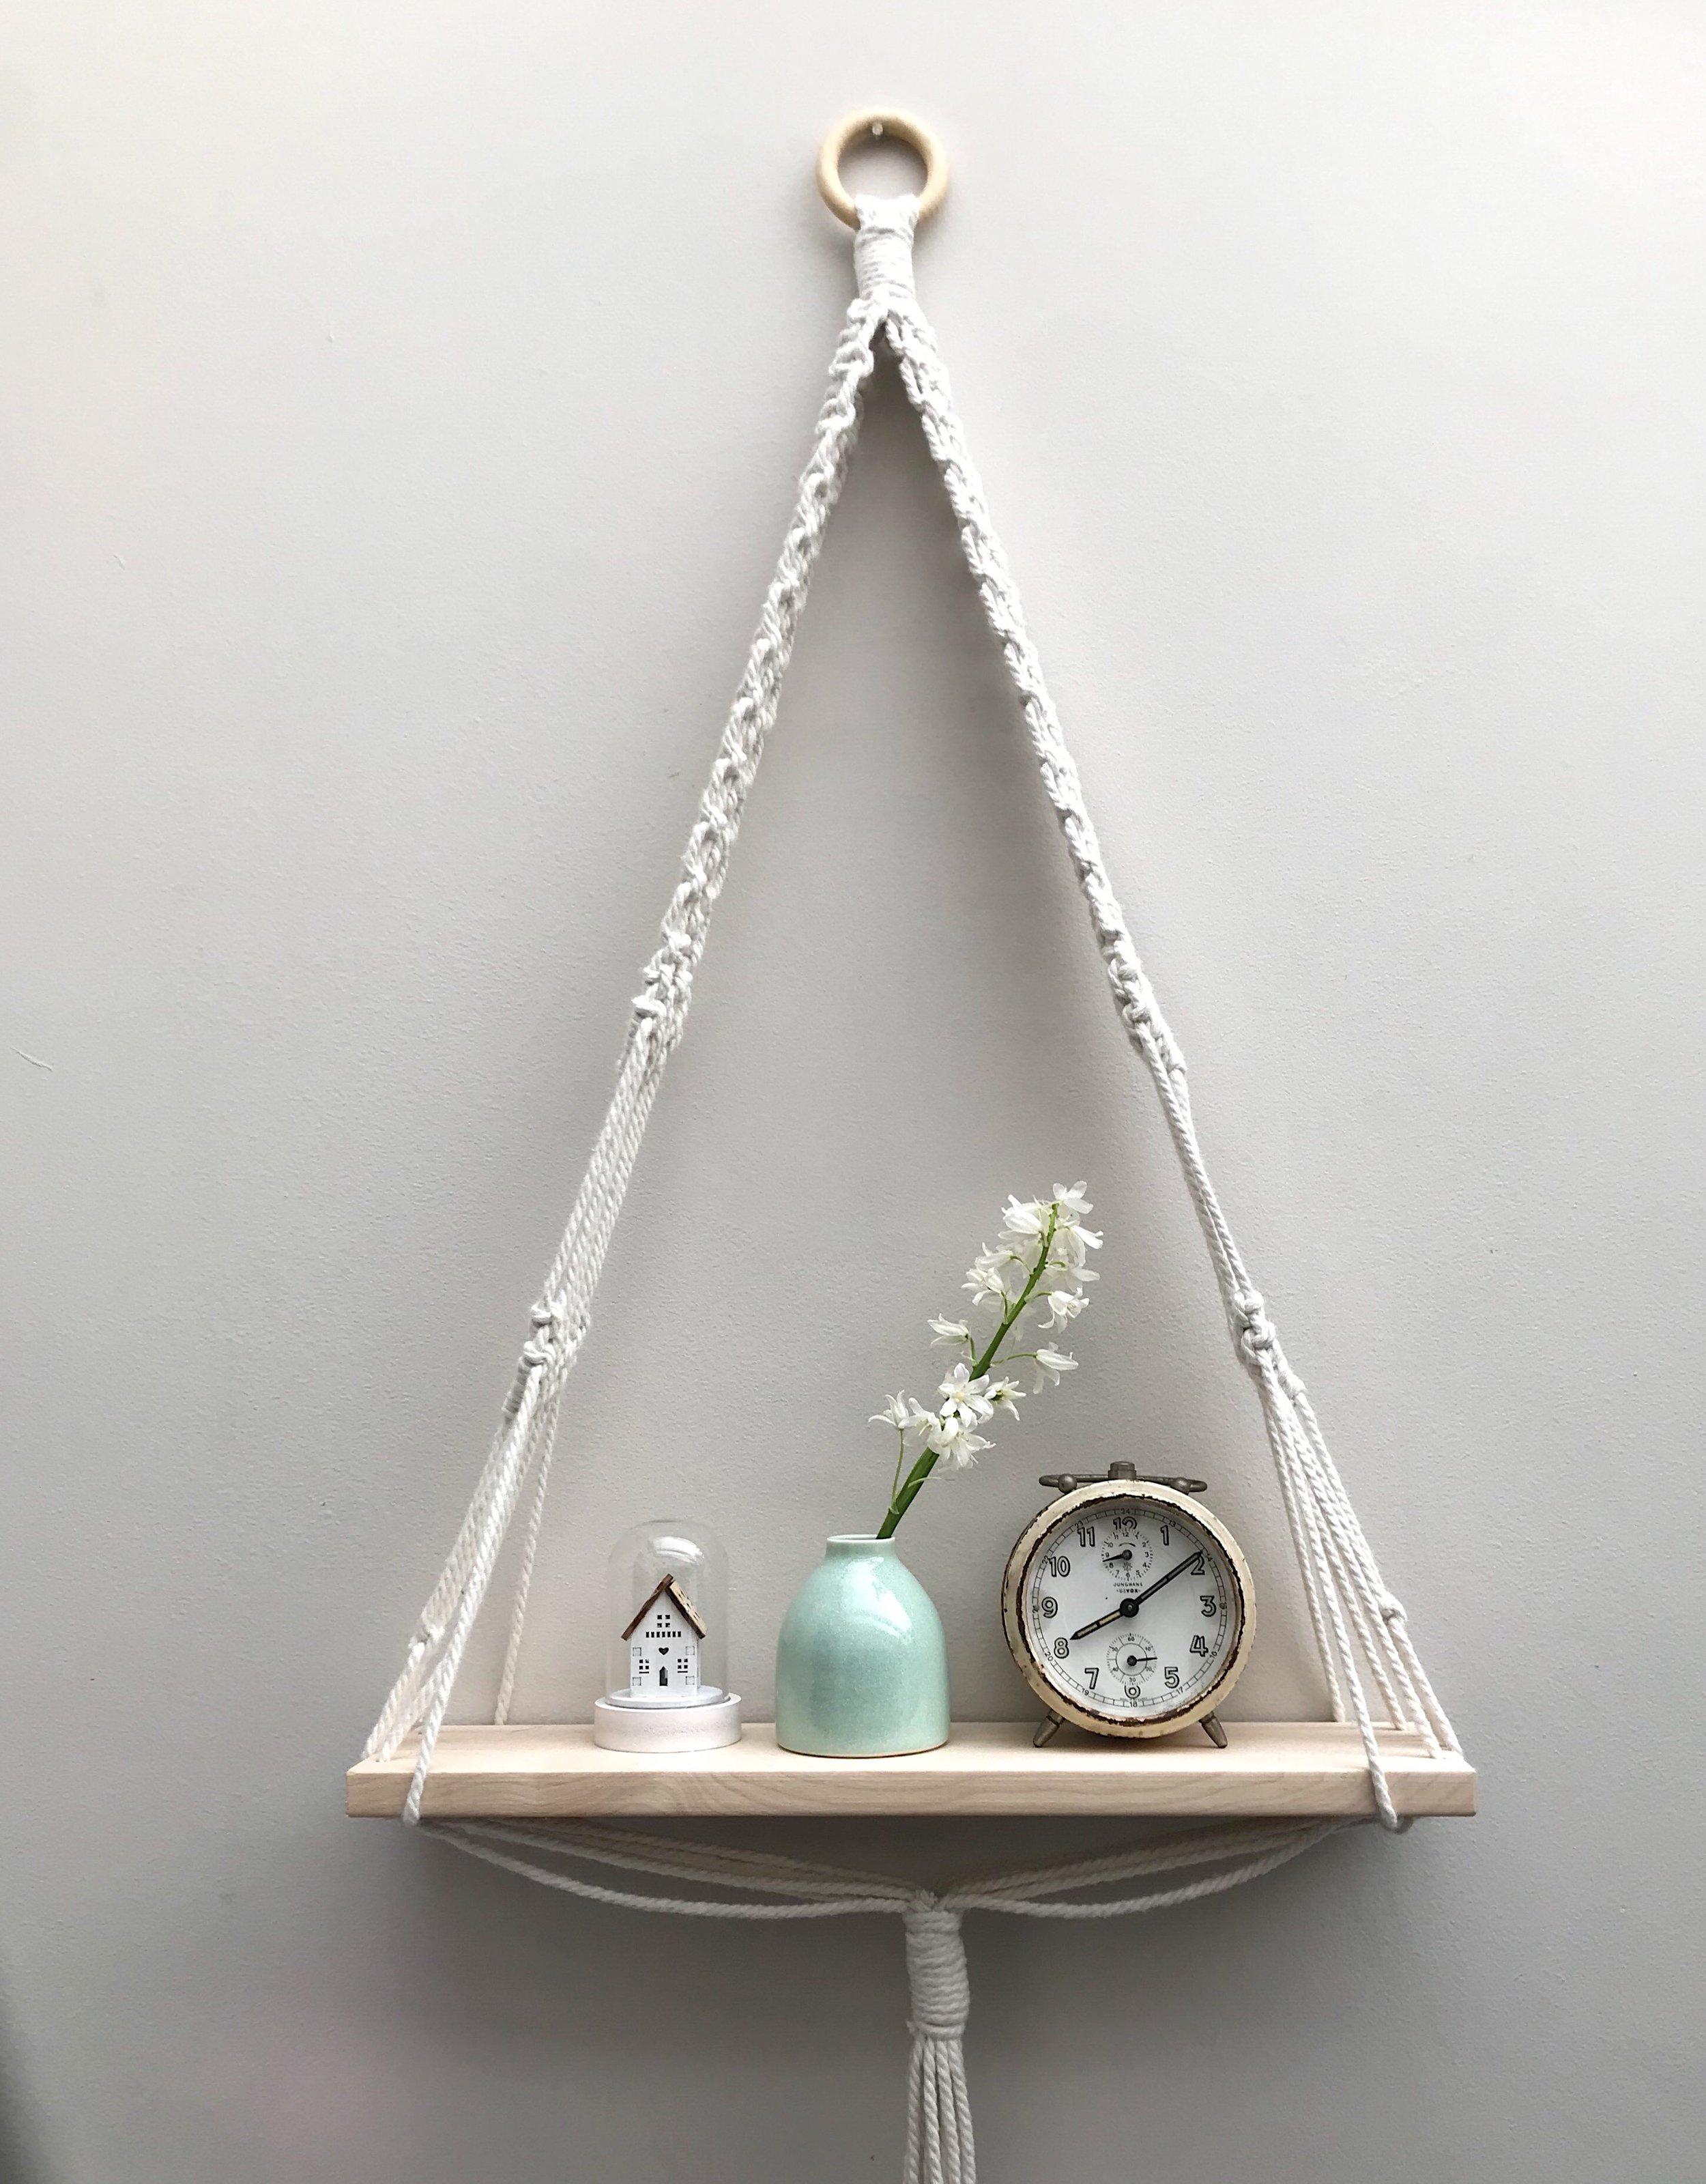 Macrame shelf by Isabella Strambio featuring mint green bud-vase by Kt Robbins Ceramics